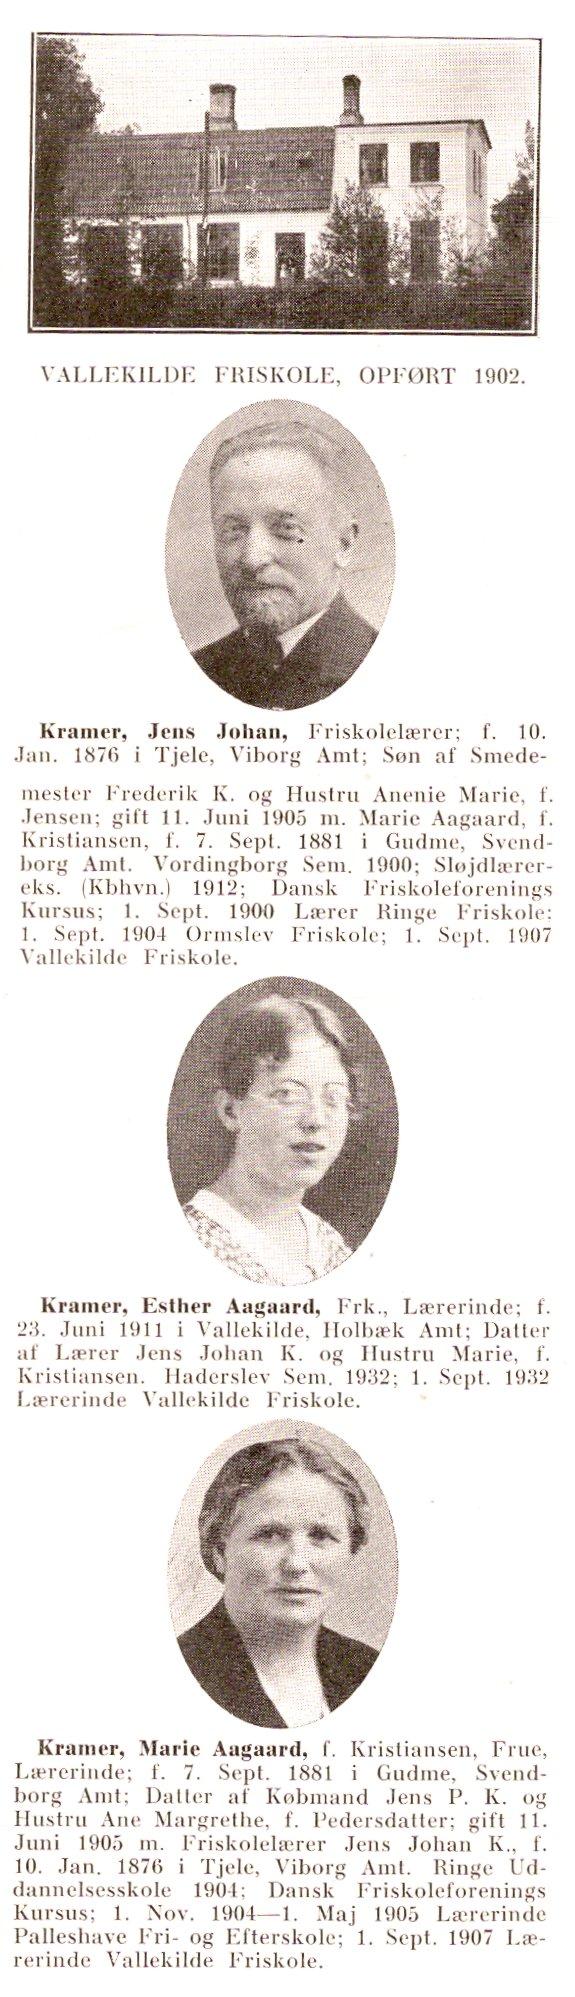 Jens johan kramer f 1876 vallekilde friskole